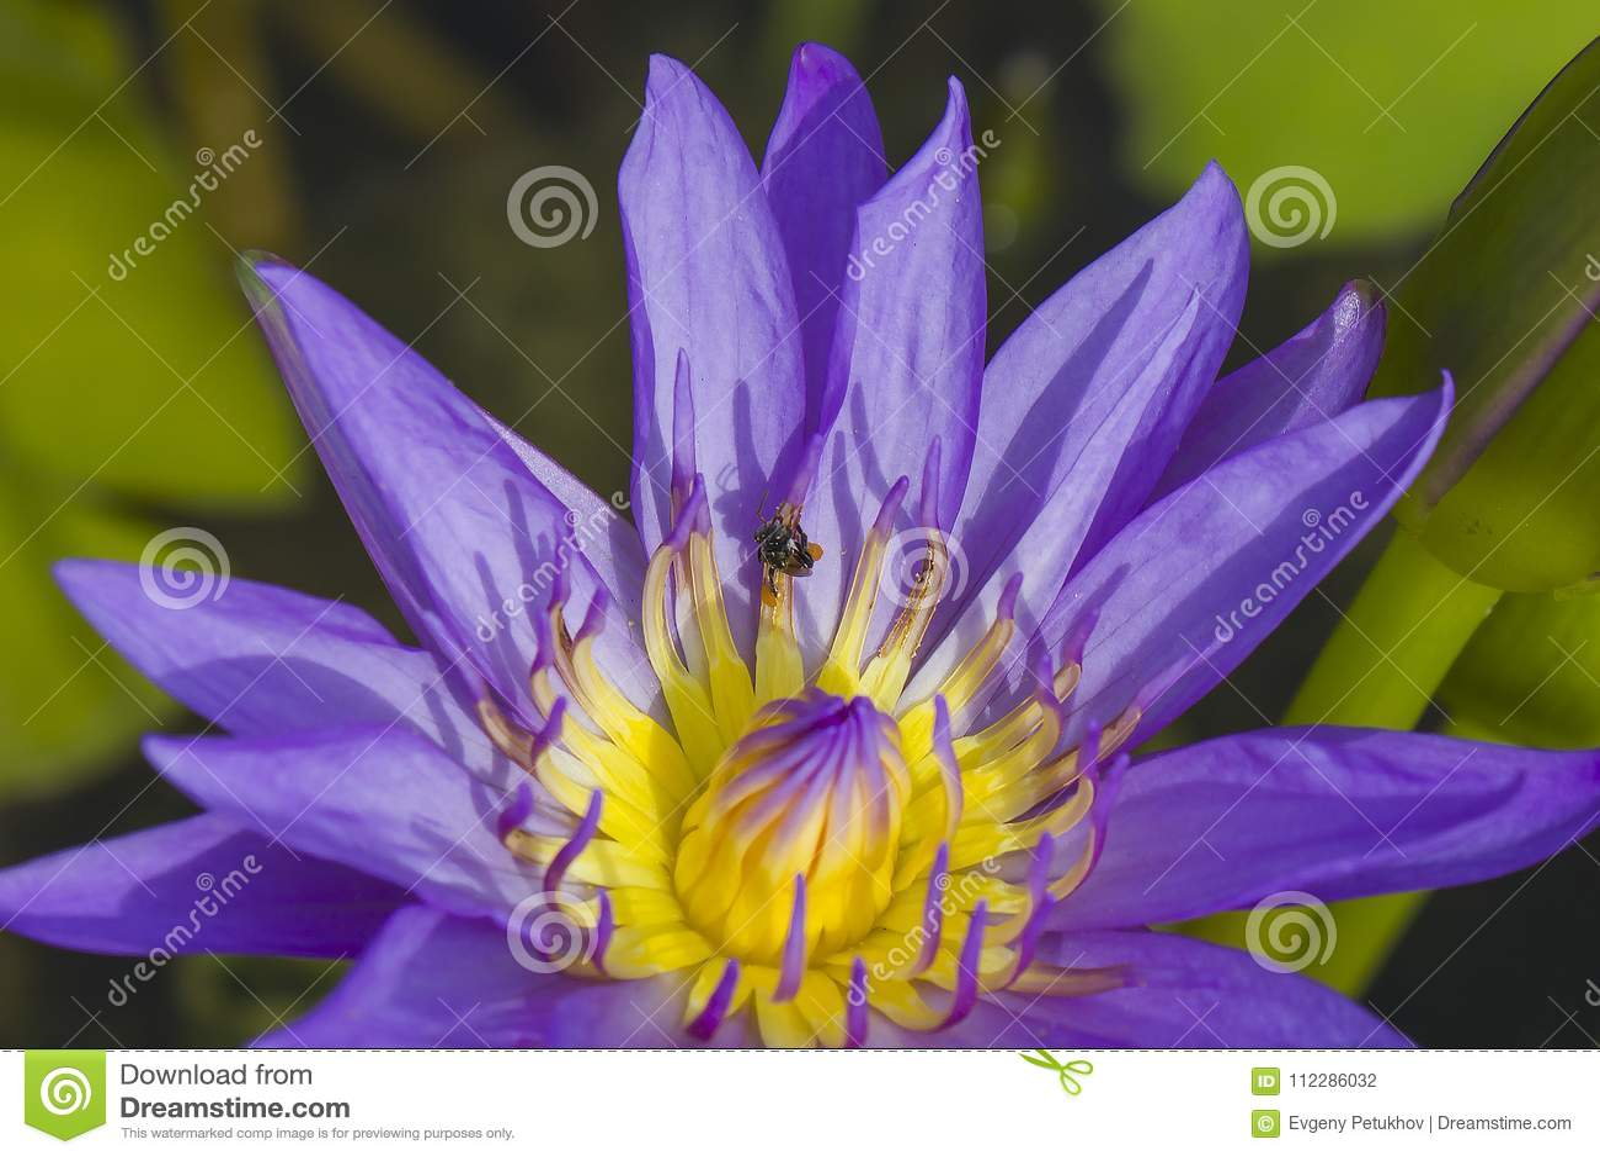 Elegant Blue Lily Flower Lotus In Water The Lotus Flower Water Lily